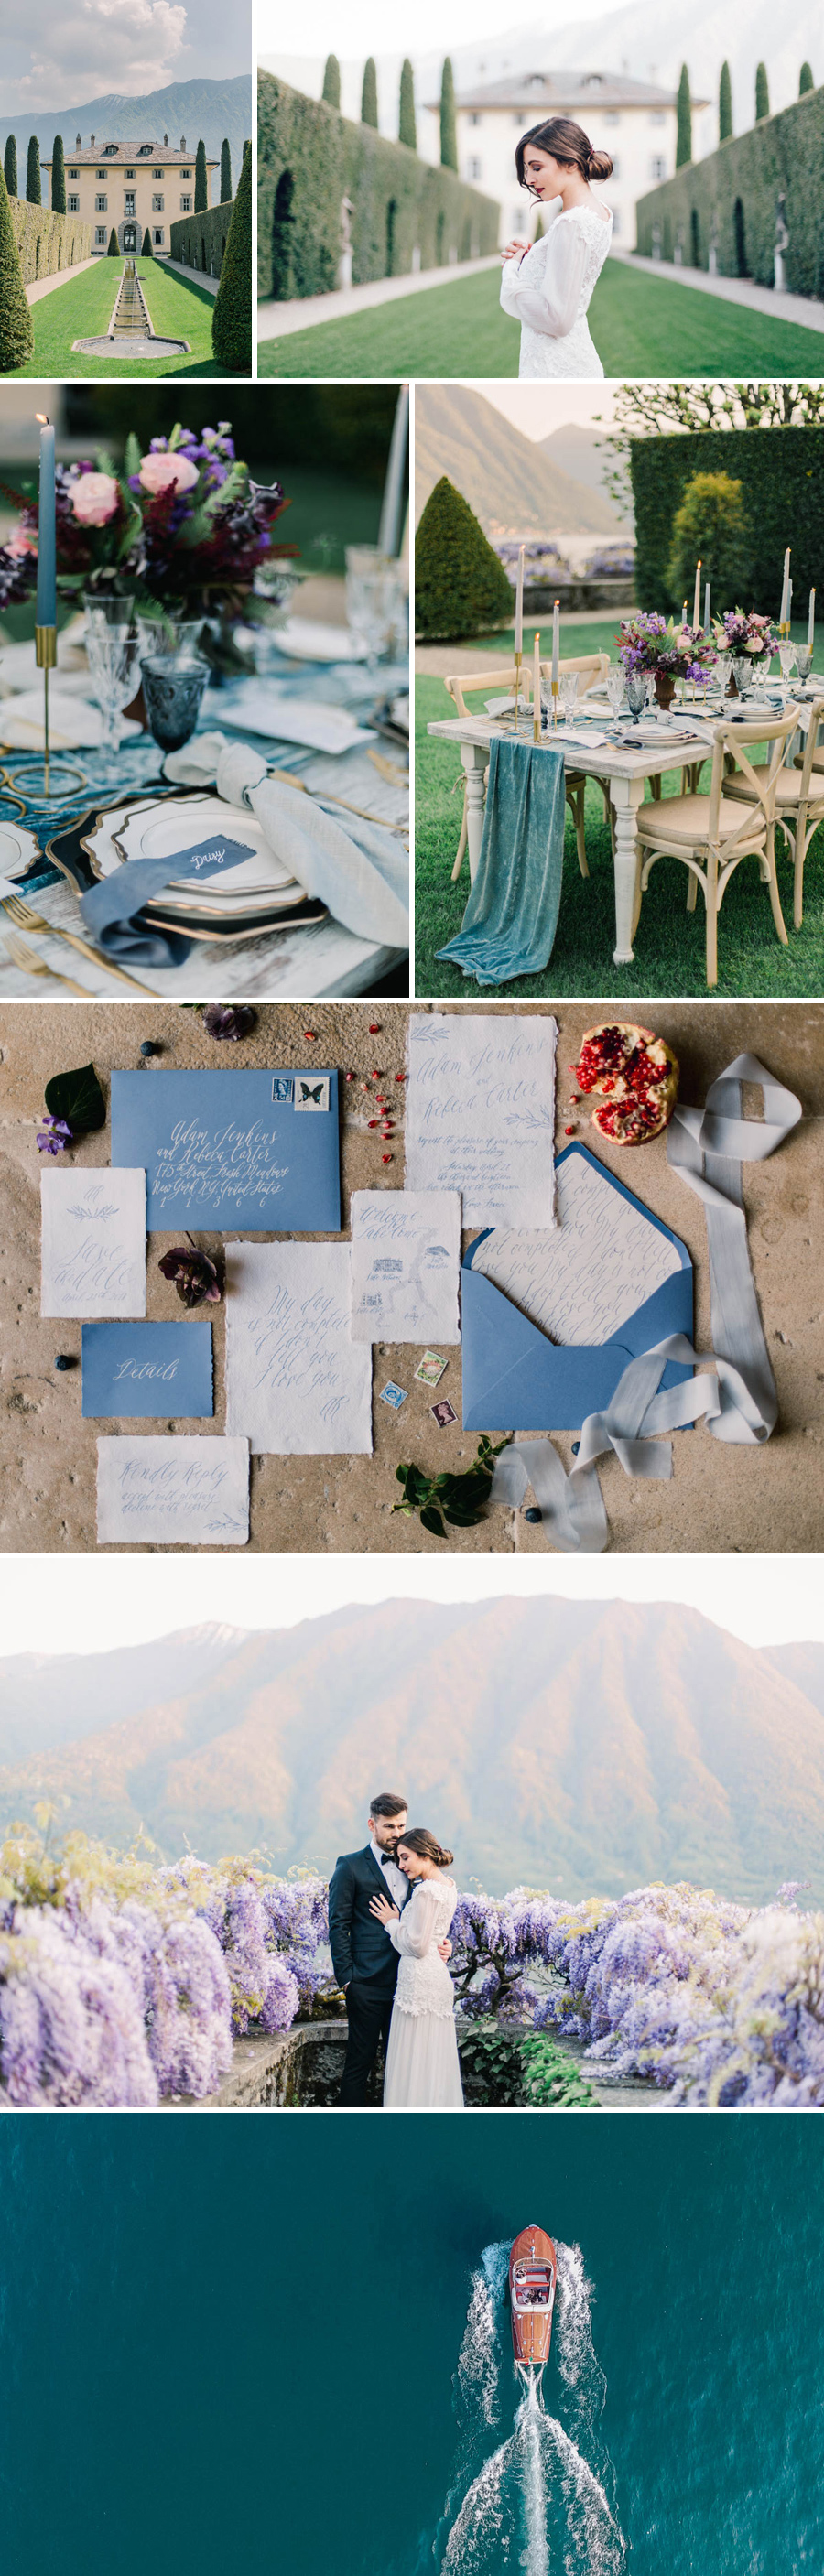 wedding villa balbiano lake como